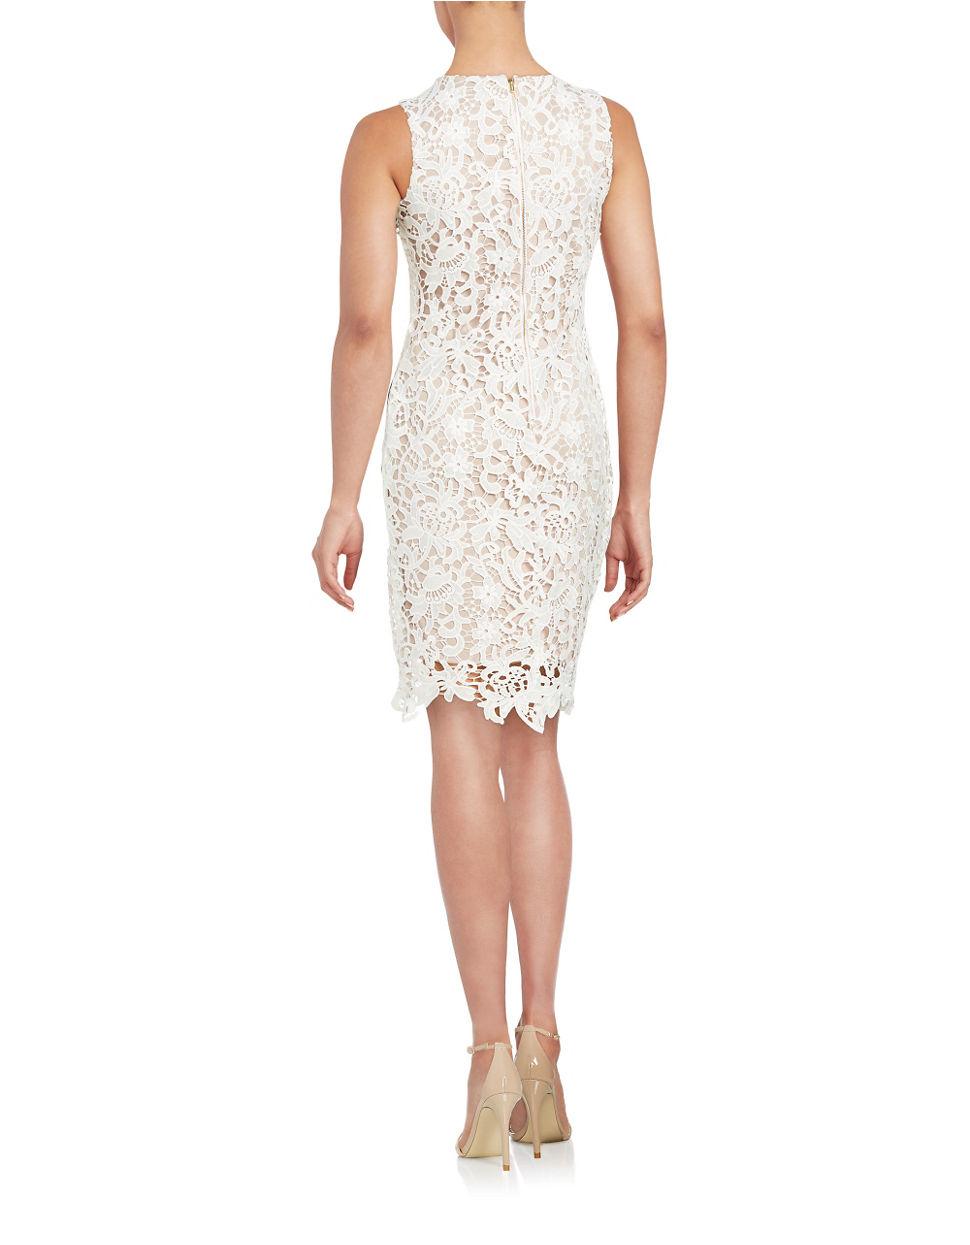 2eabaaa1 Calvin Klein Lace Sheath Dress in Natural - Lyst